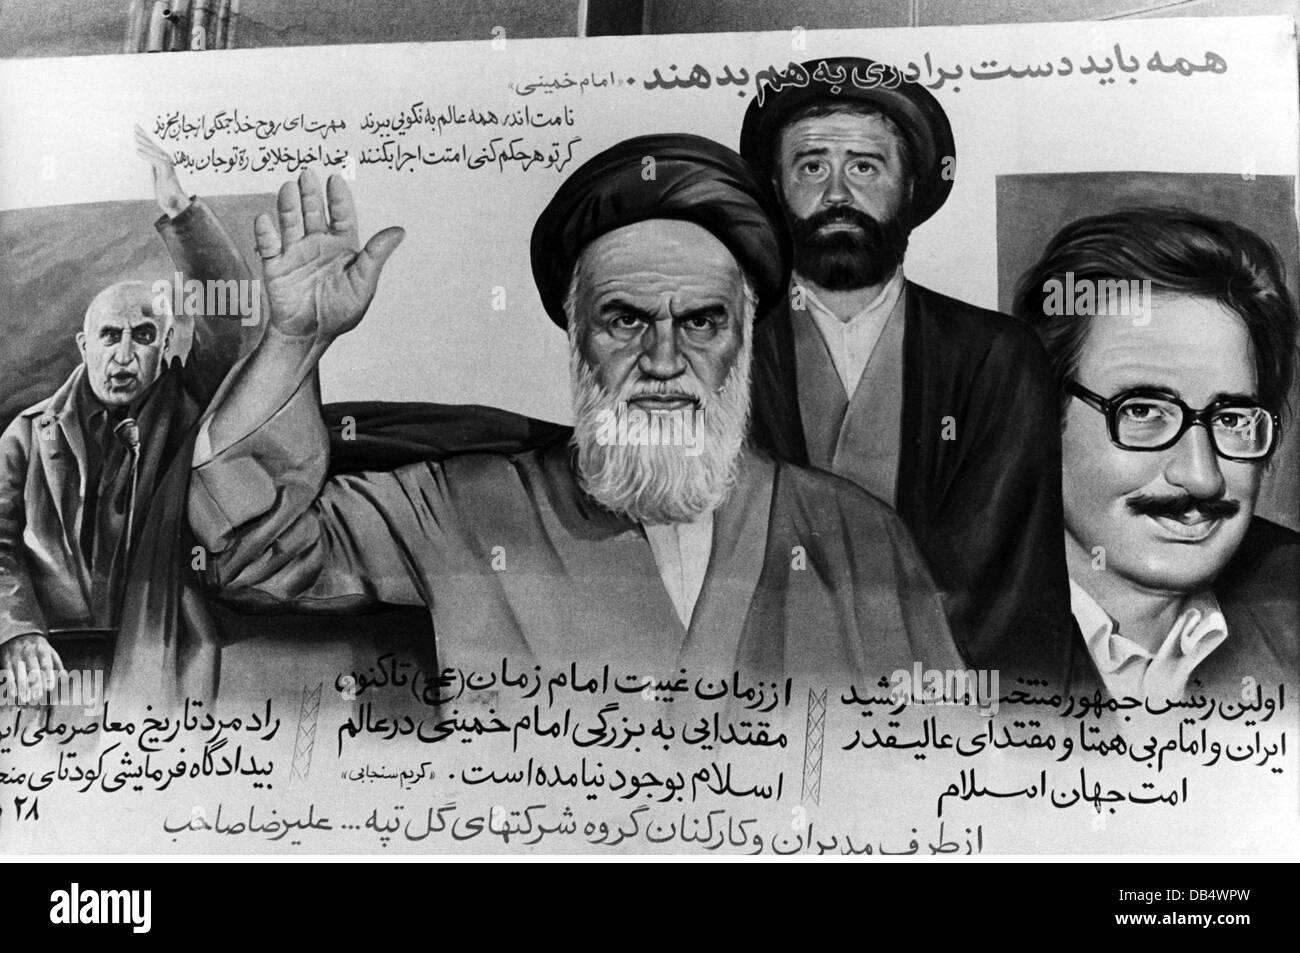 politics, propaganda, poster with the Iranian leaders Muhammed Mossadegh, ayatollah Ruhollah Khomeini, Ahmed Khomeini, - Stock Image